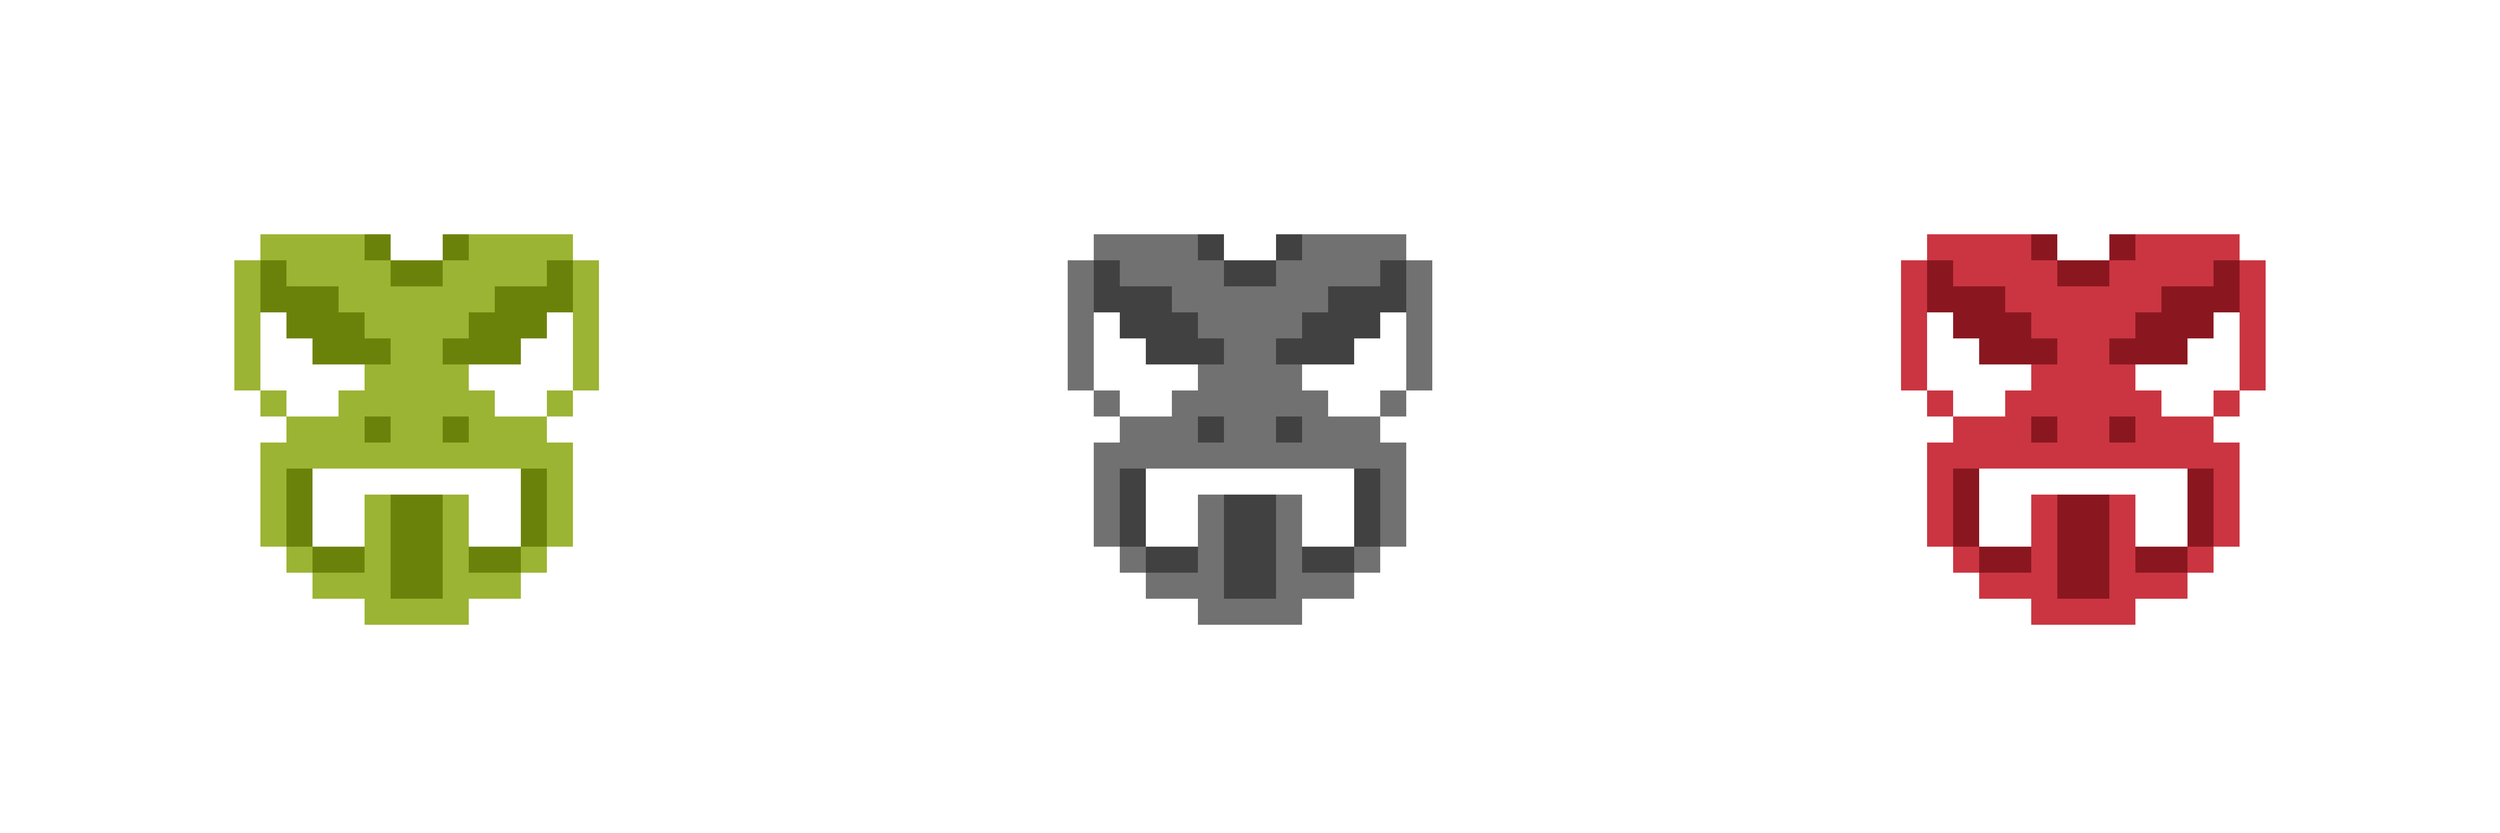 Pixel Art - 8Bit Taniwha